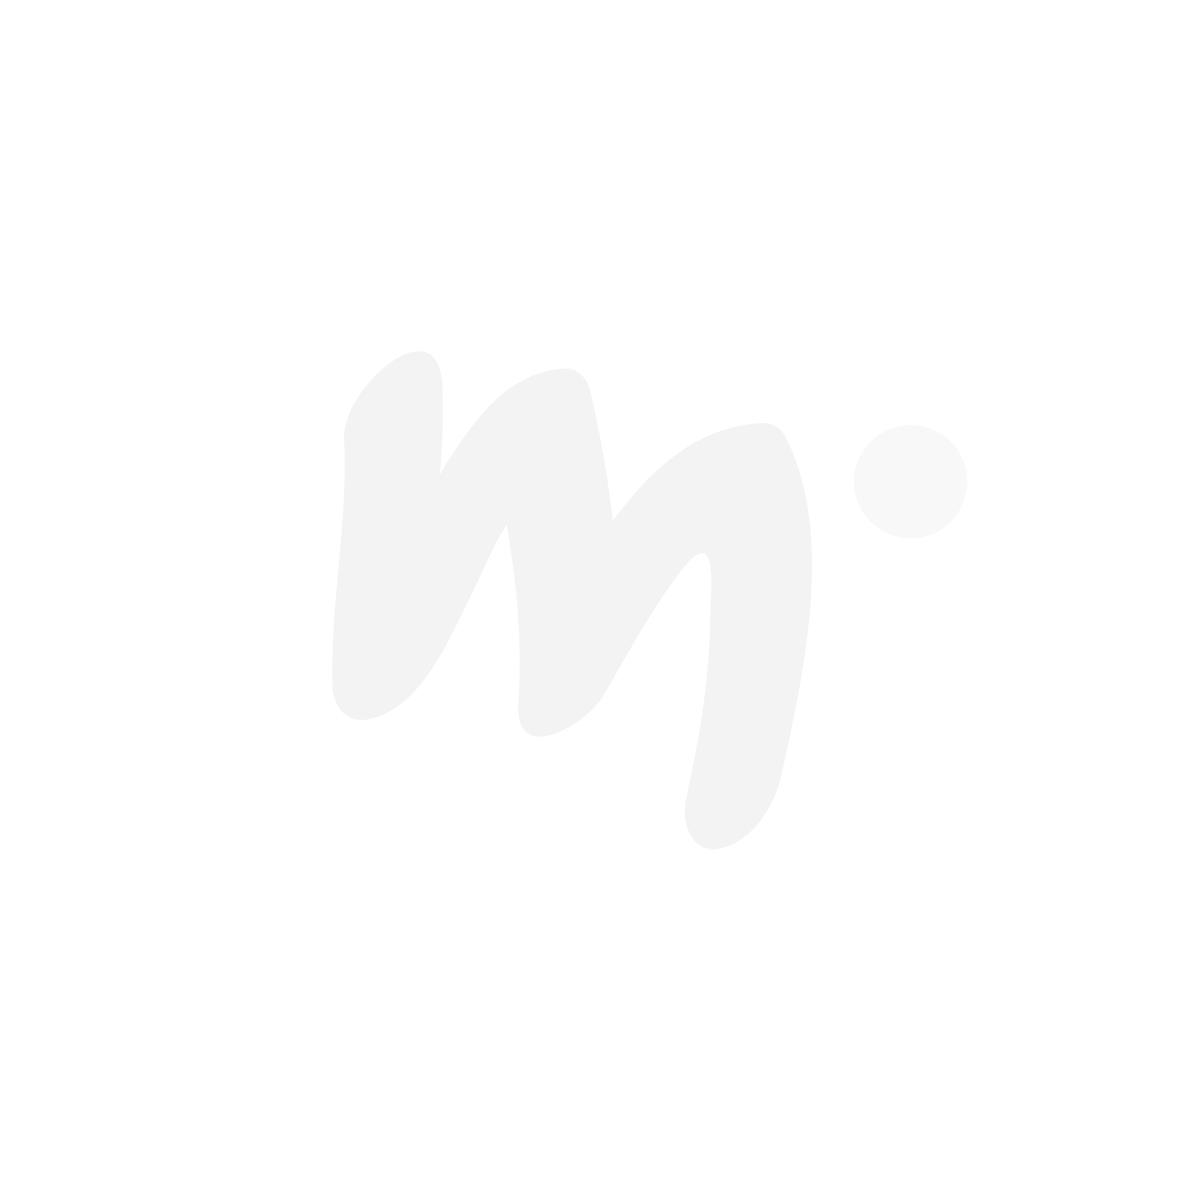 Moomin Moominvalley Sketch Soup Plate